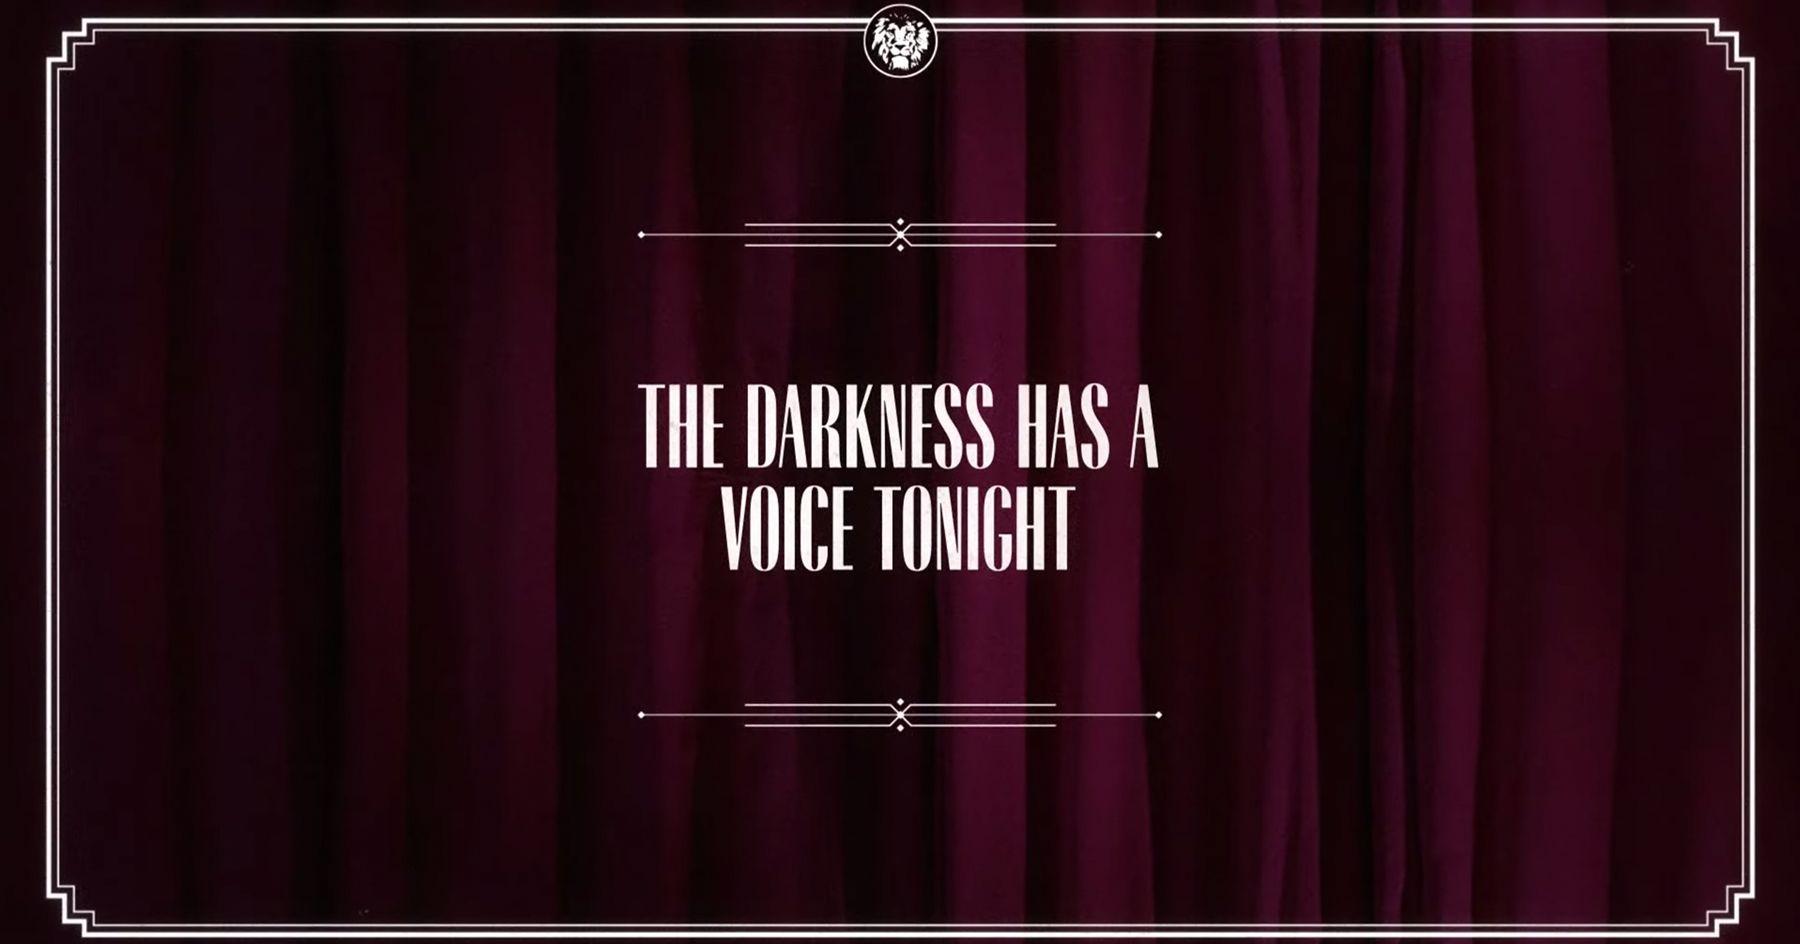 Amber Run - The Darkness Has a Voice | Musik | Was is hier eigentlich los?